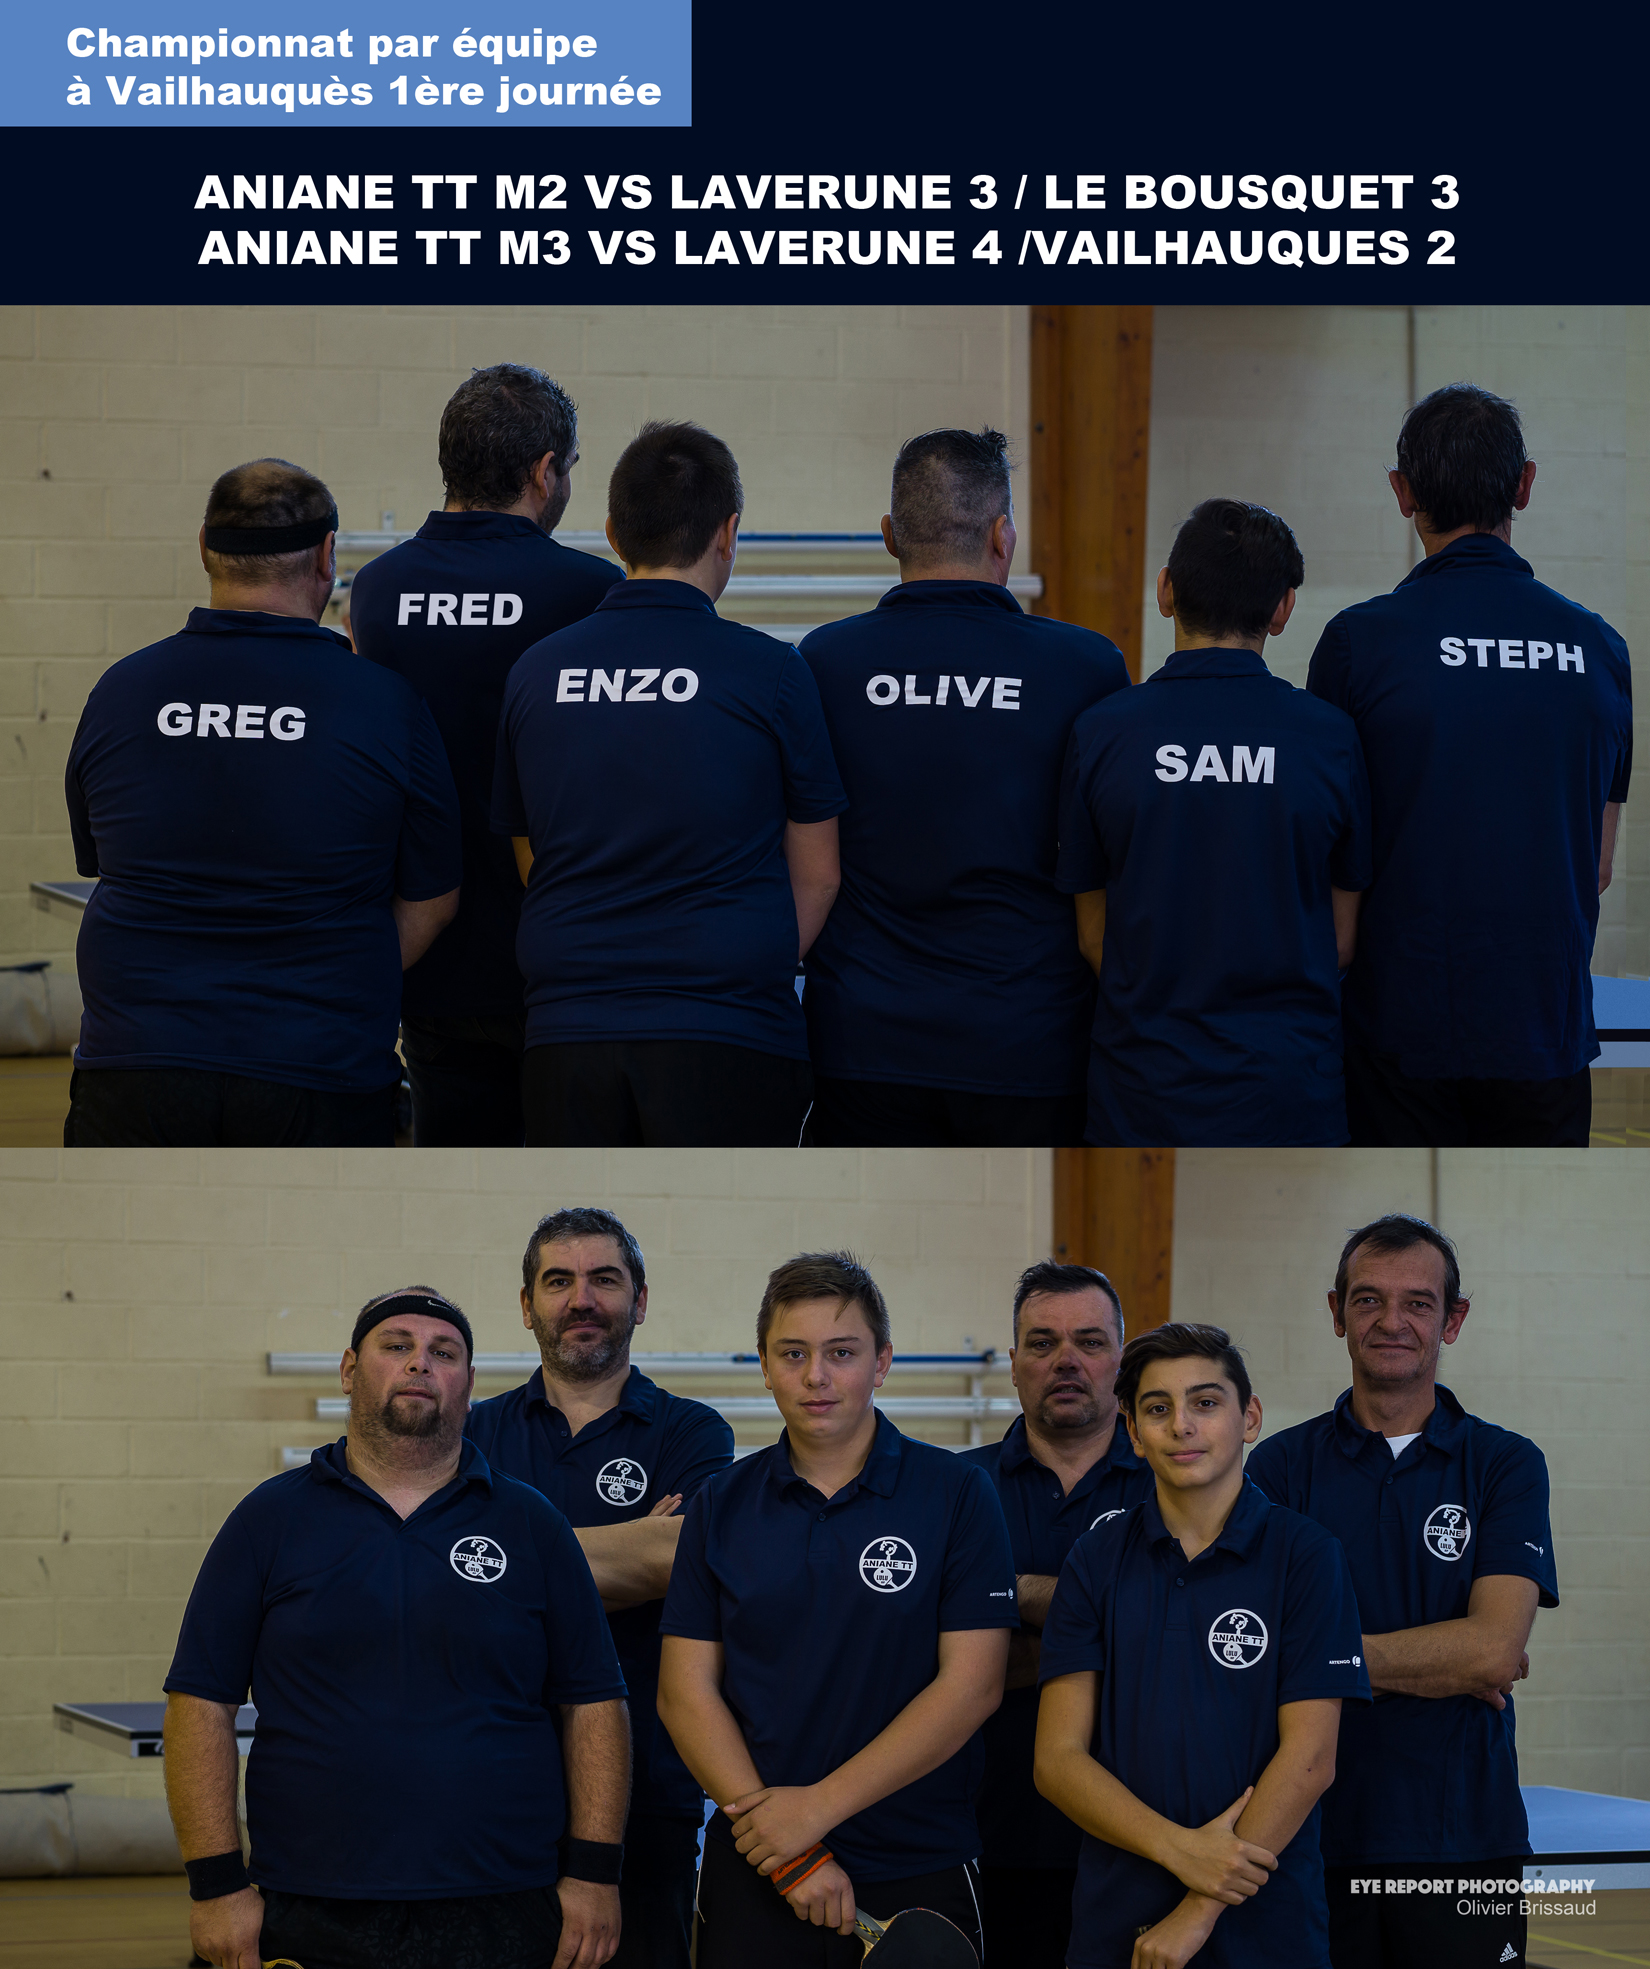 _montage-équipes-Aniane-TT